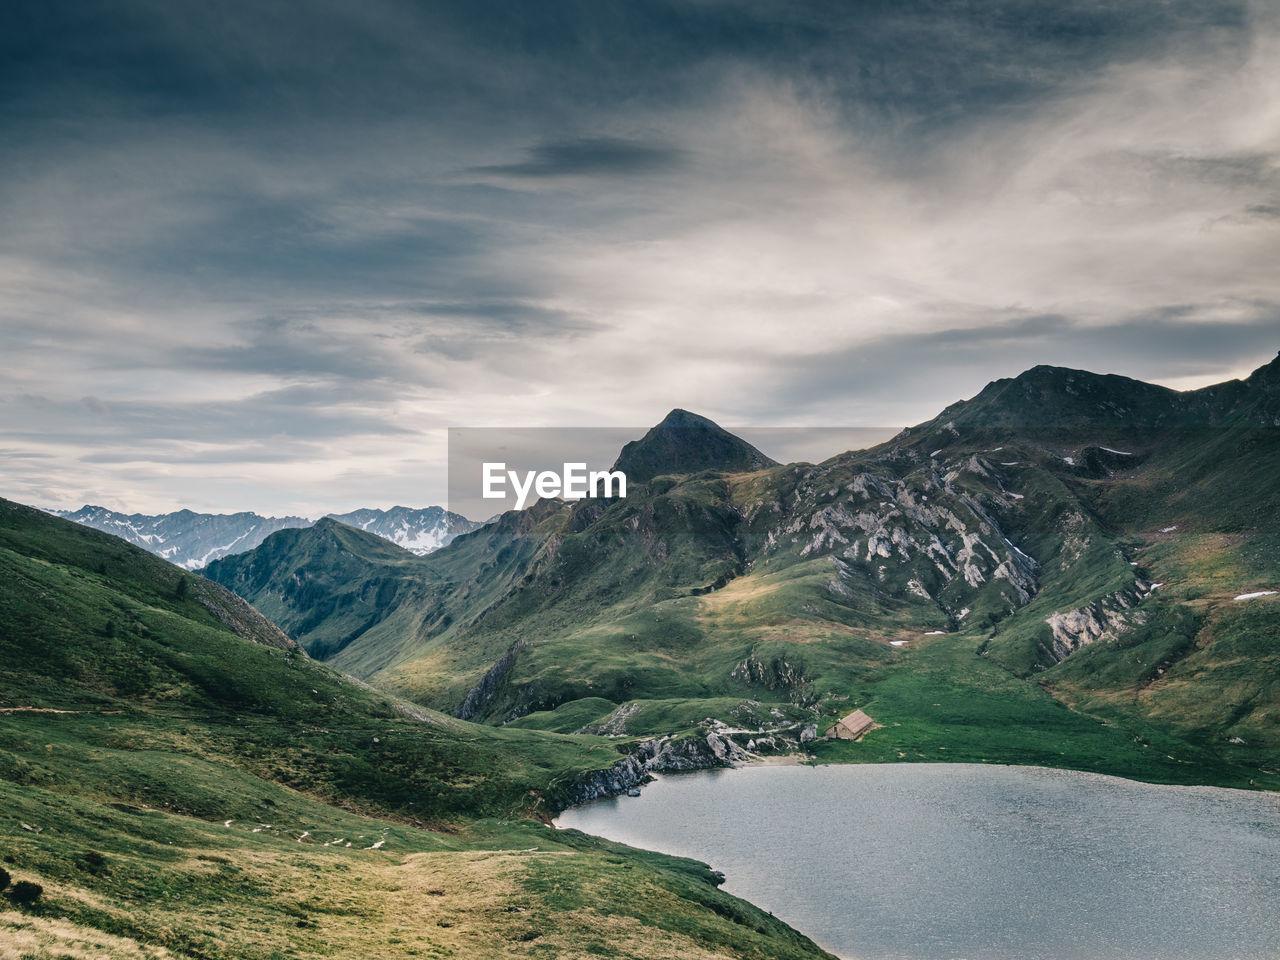 mountain, scenics - nature, sky, cloud - sky, beauty in nature, tranquil scene, mountain range, tranquility, water, environment, non-urban scene, landscape, nature, no people, day, lake, idyllic, valley, outdoors, mountain peak